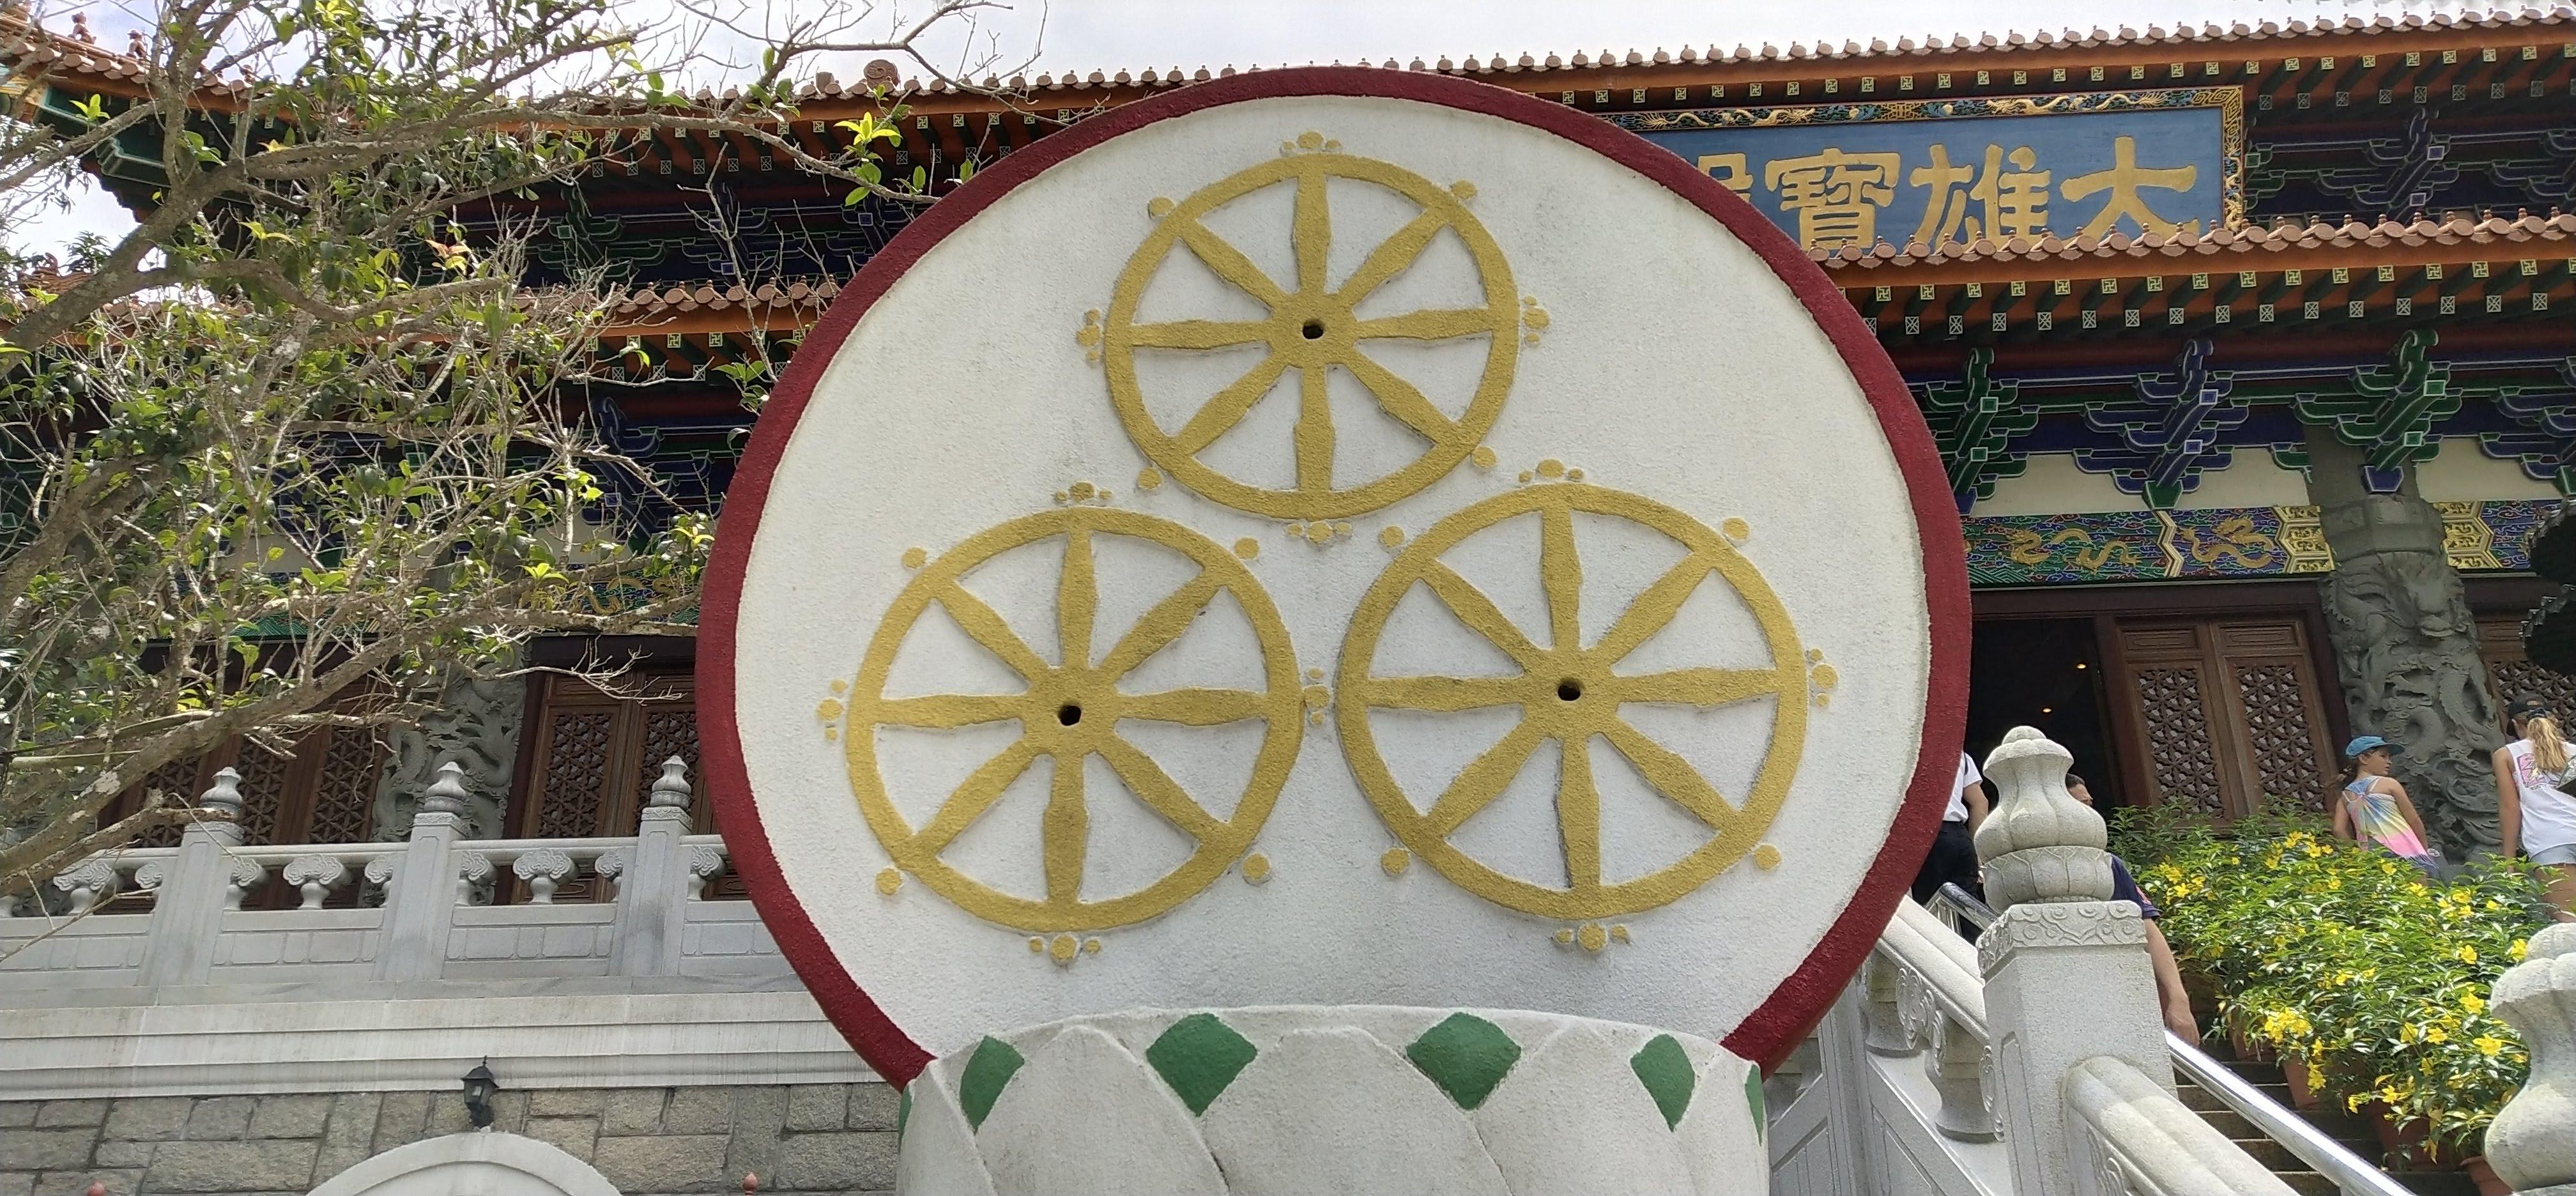 Traditionally Buddhists use Dharma Wheel to represent Buddha.